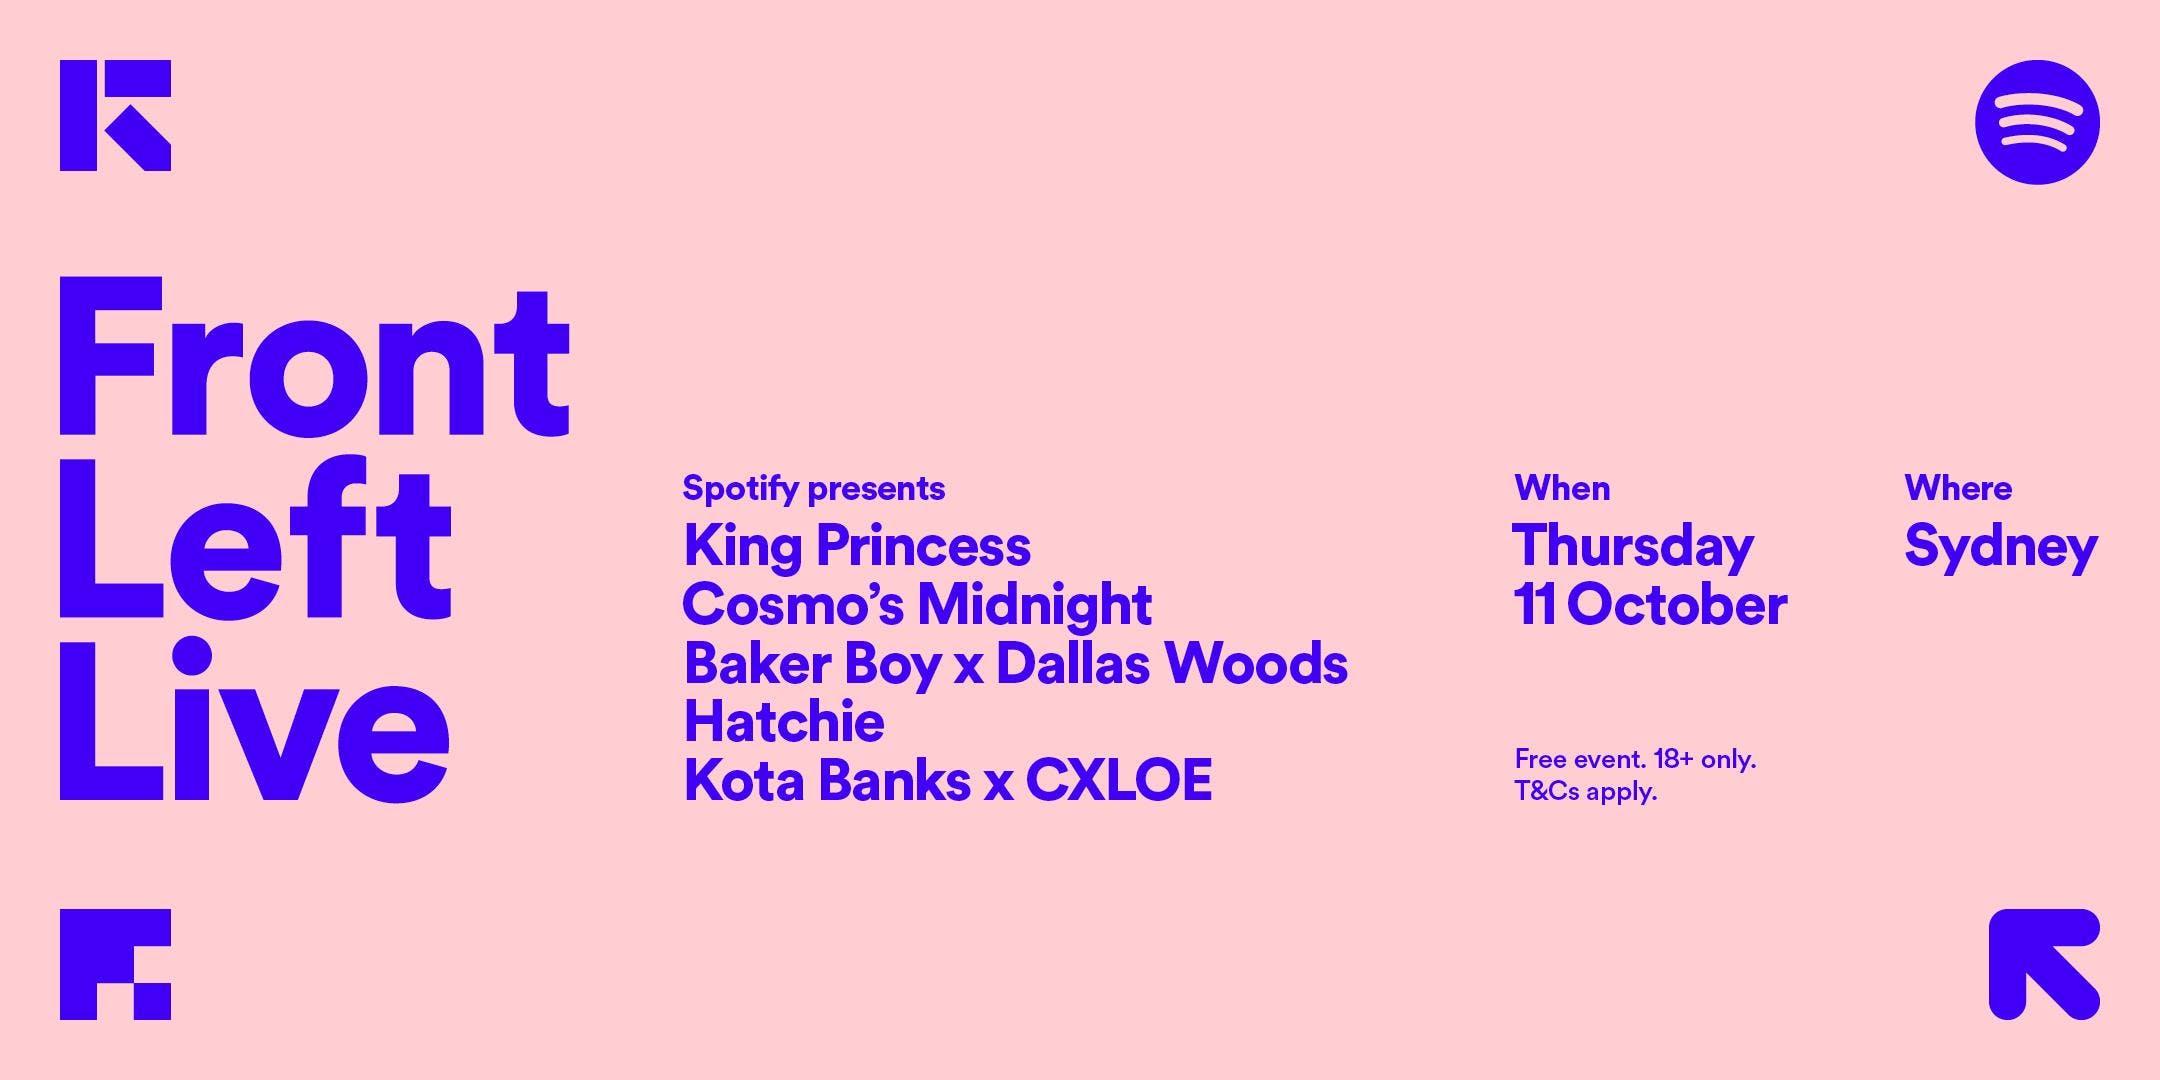 Spotify presents: Front Left Live / Thursday, October 11 7